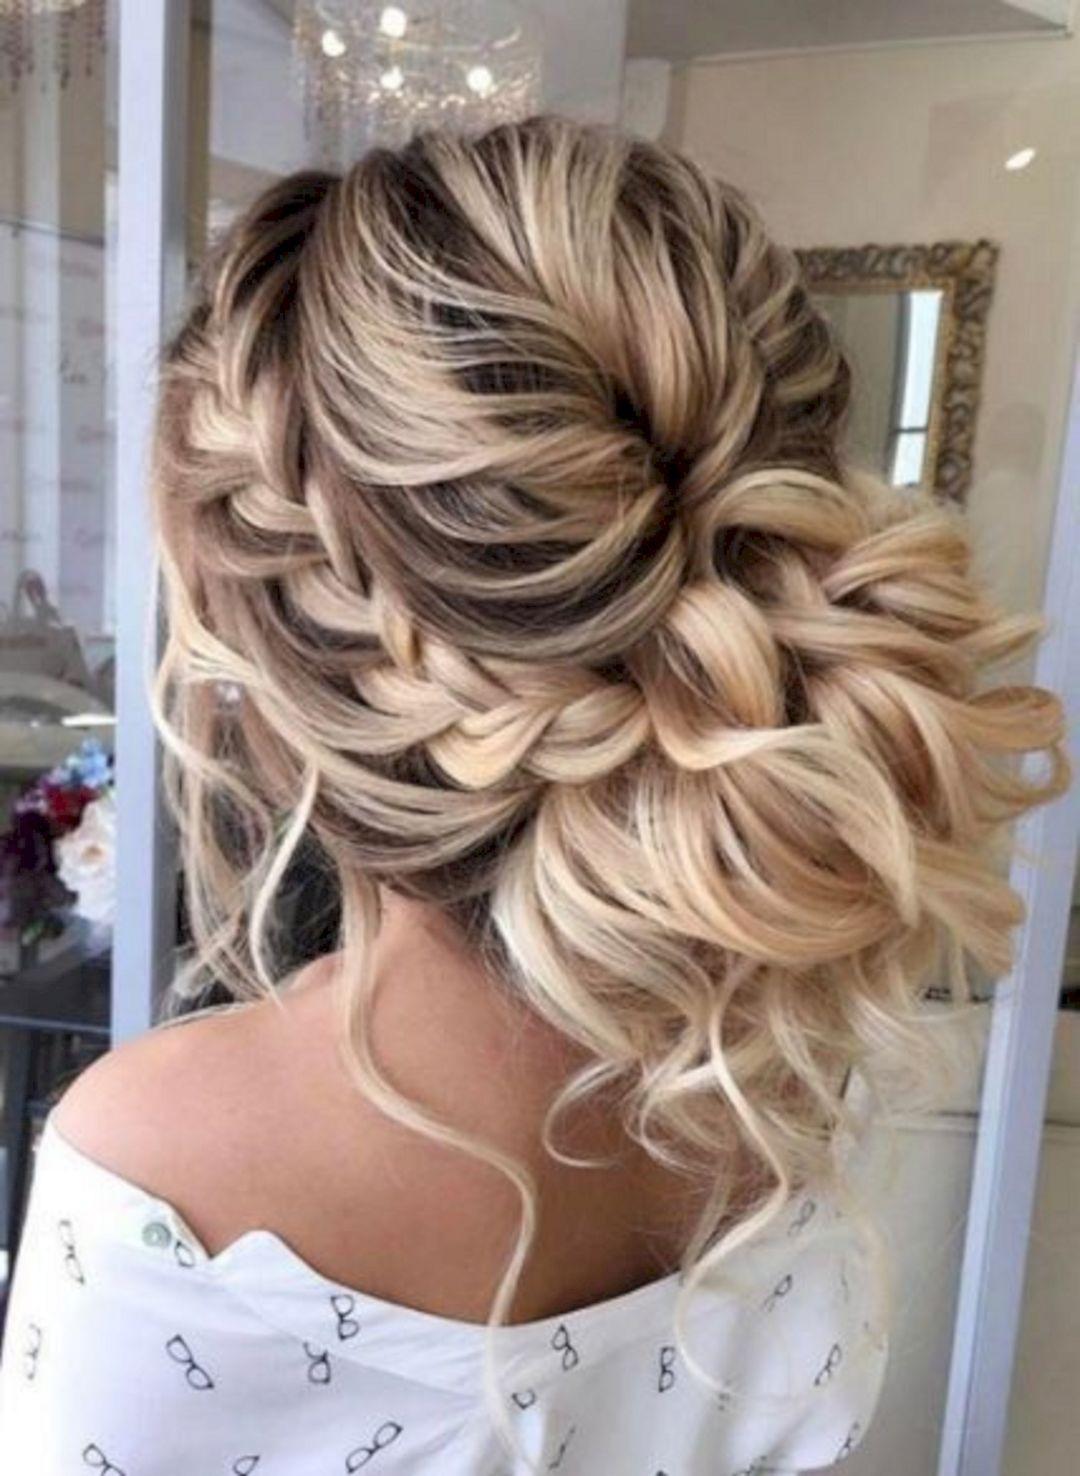 Long Hairstyles For Weddings  Wedding Bridesmaid Hairstyles for Long Hair – OOSILE